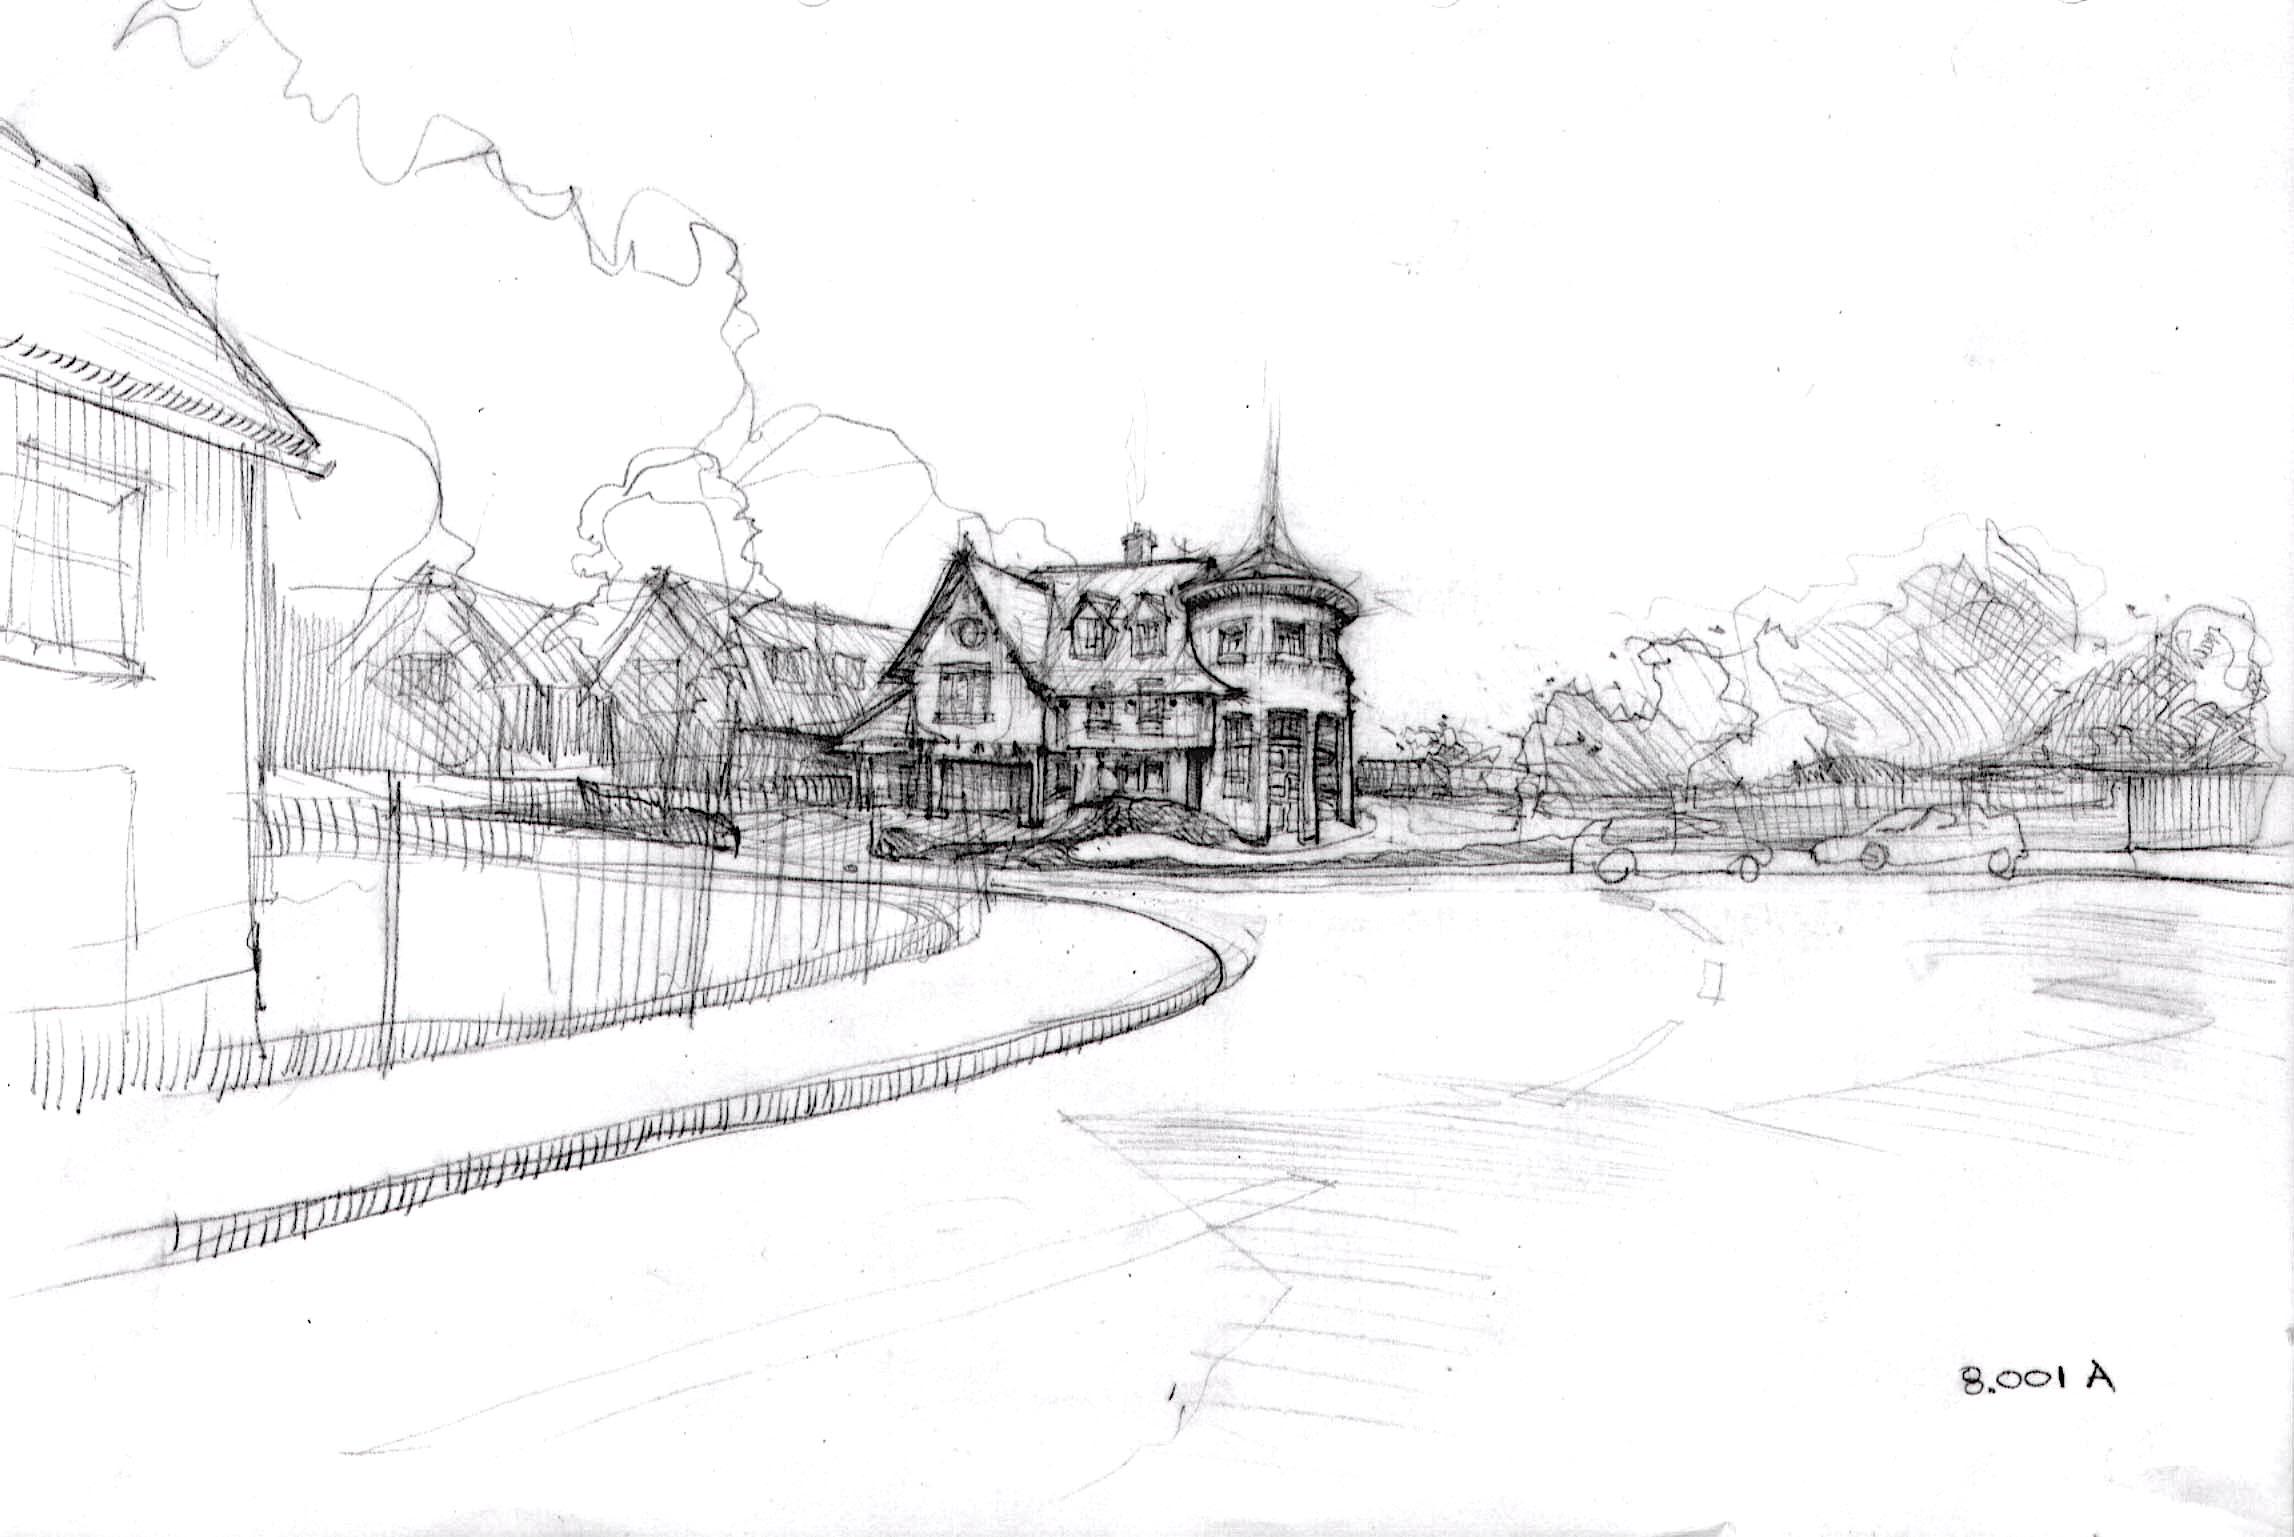 FINEarchitecture_ErnleRoad_Sketch_01.jpeg